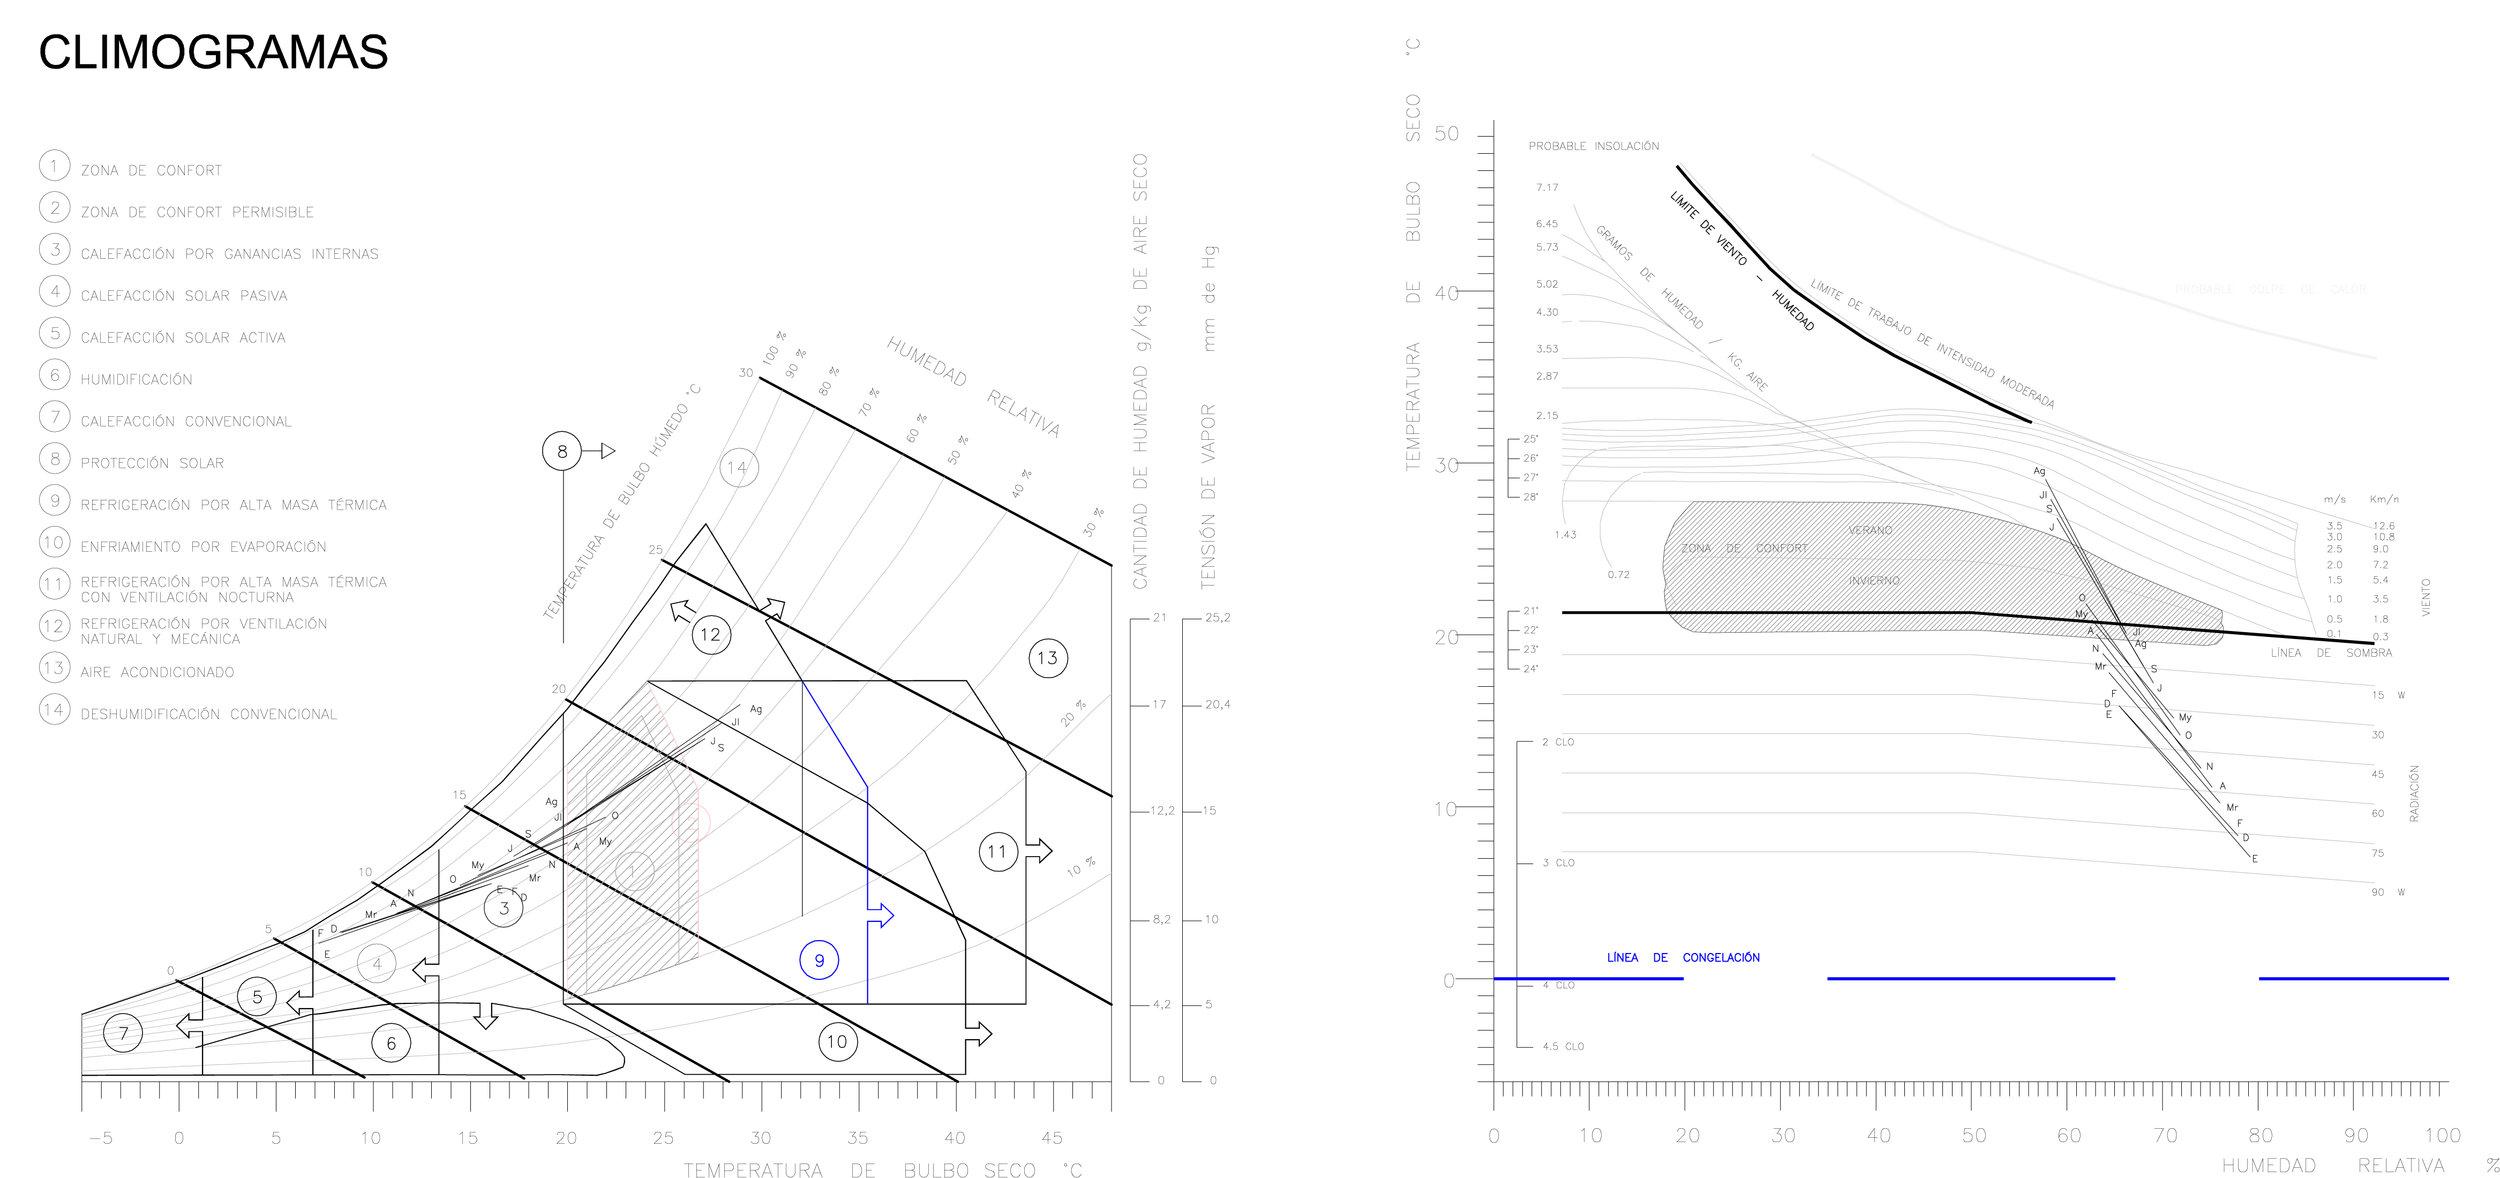 climograma copy.jpg